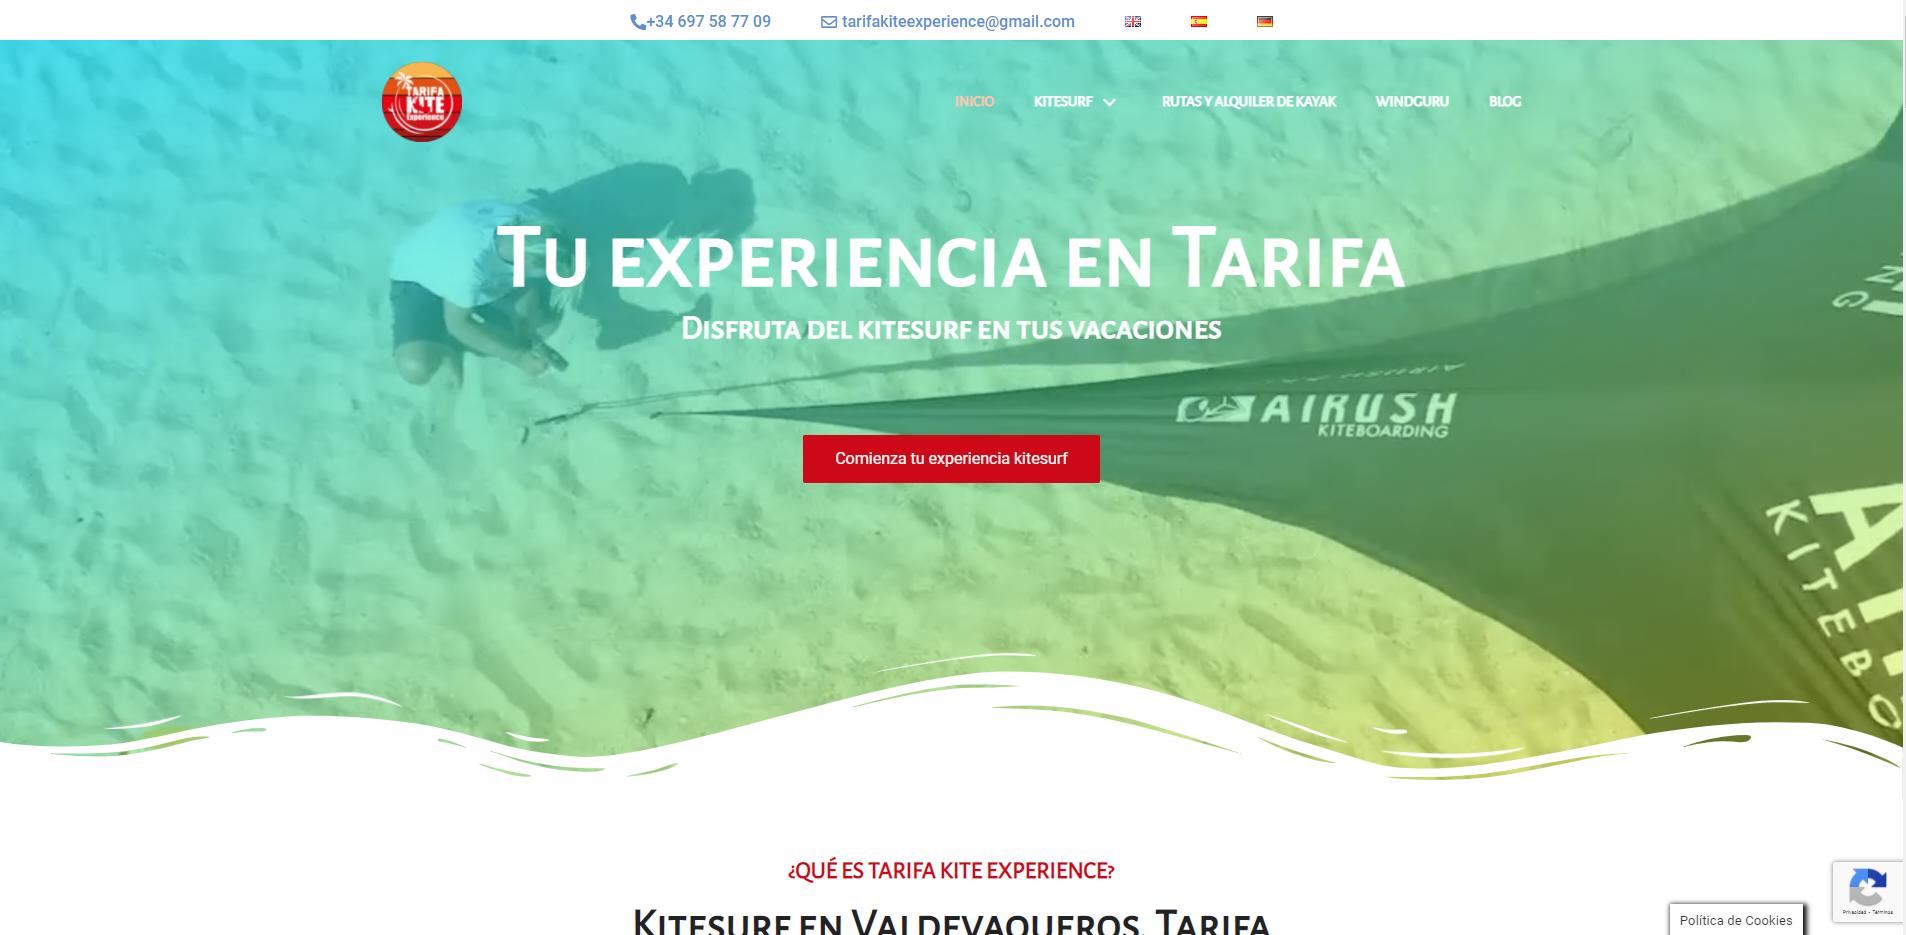 tarifa_kite_experience